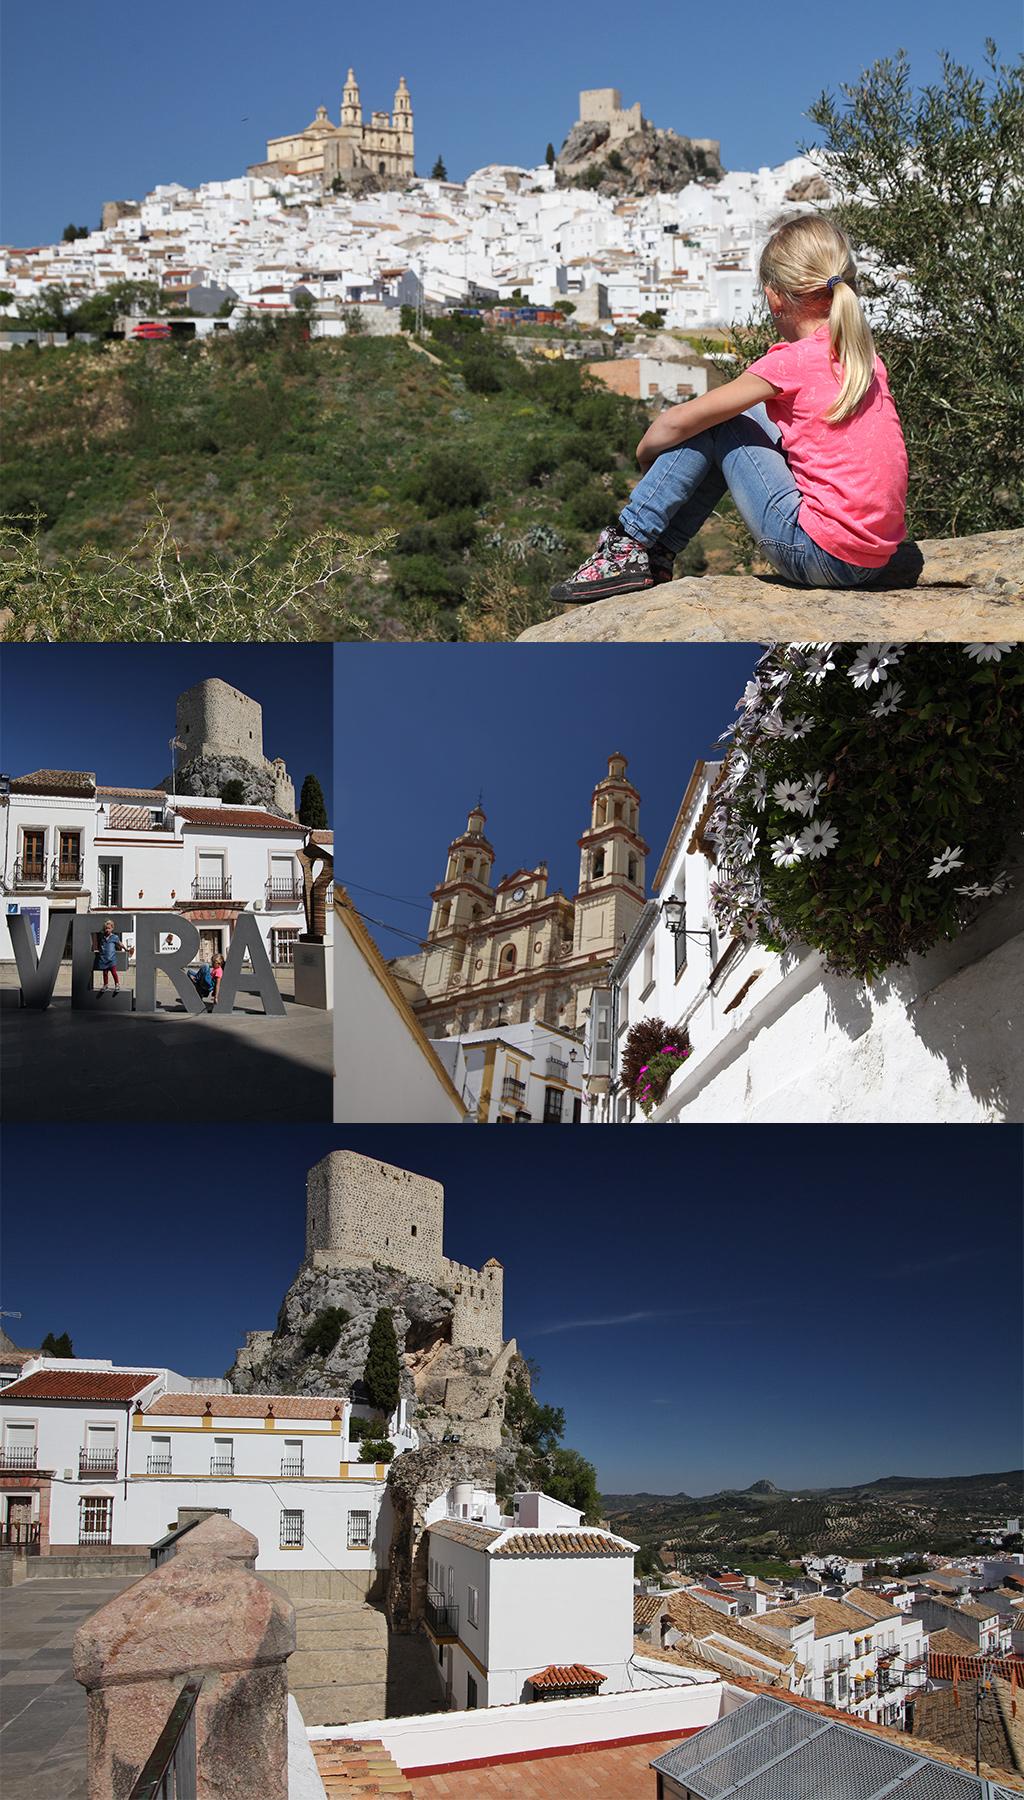 witte dorpjes van Andalusië - Olvera